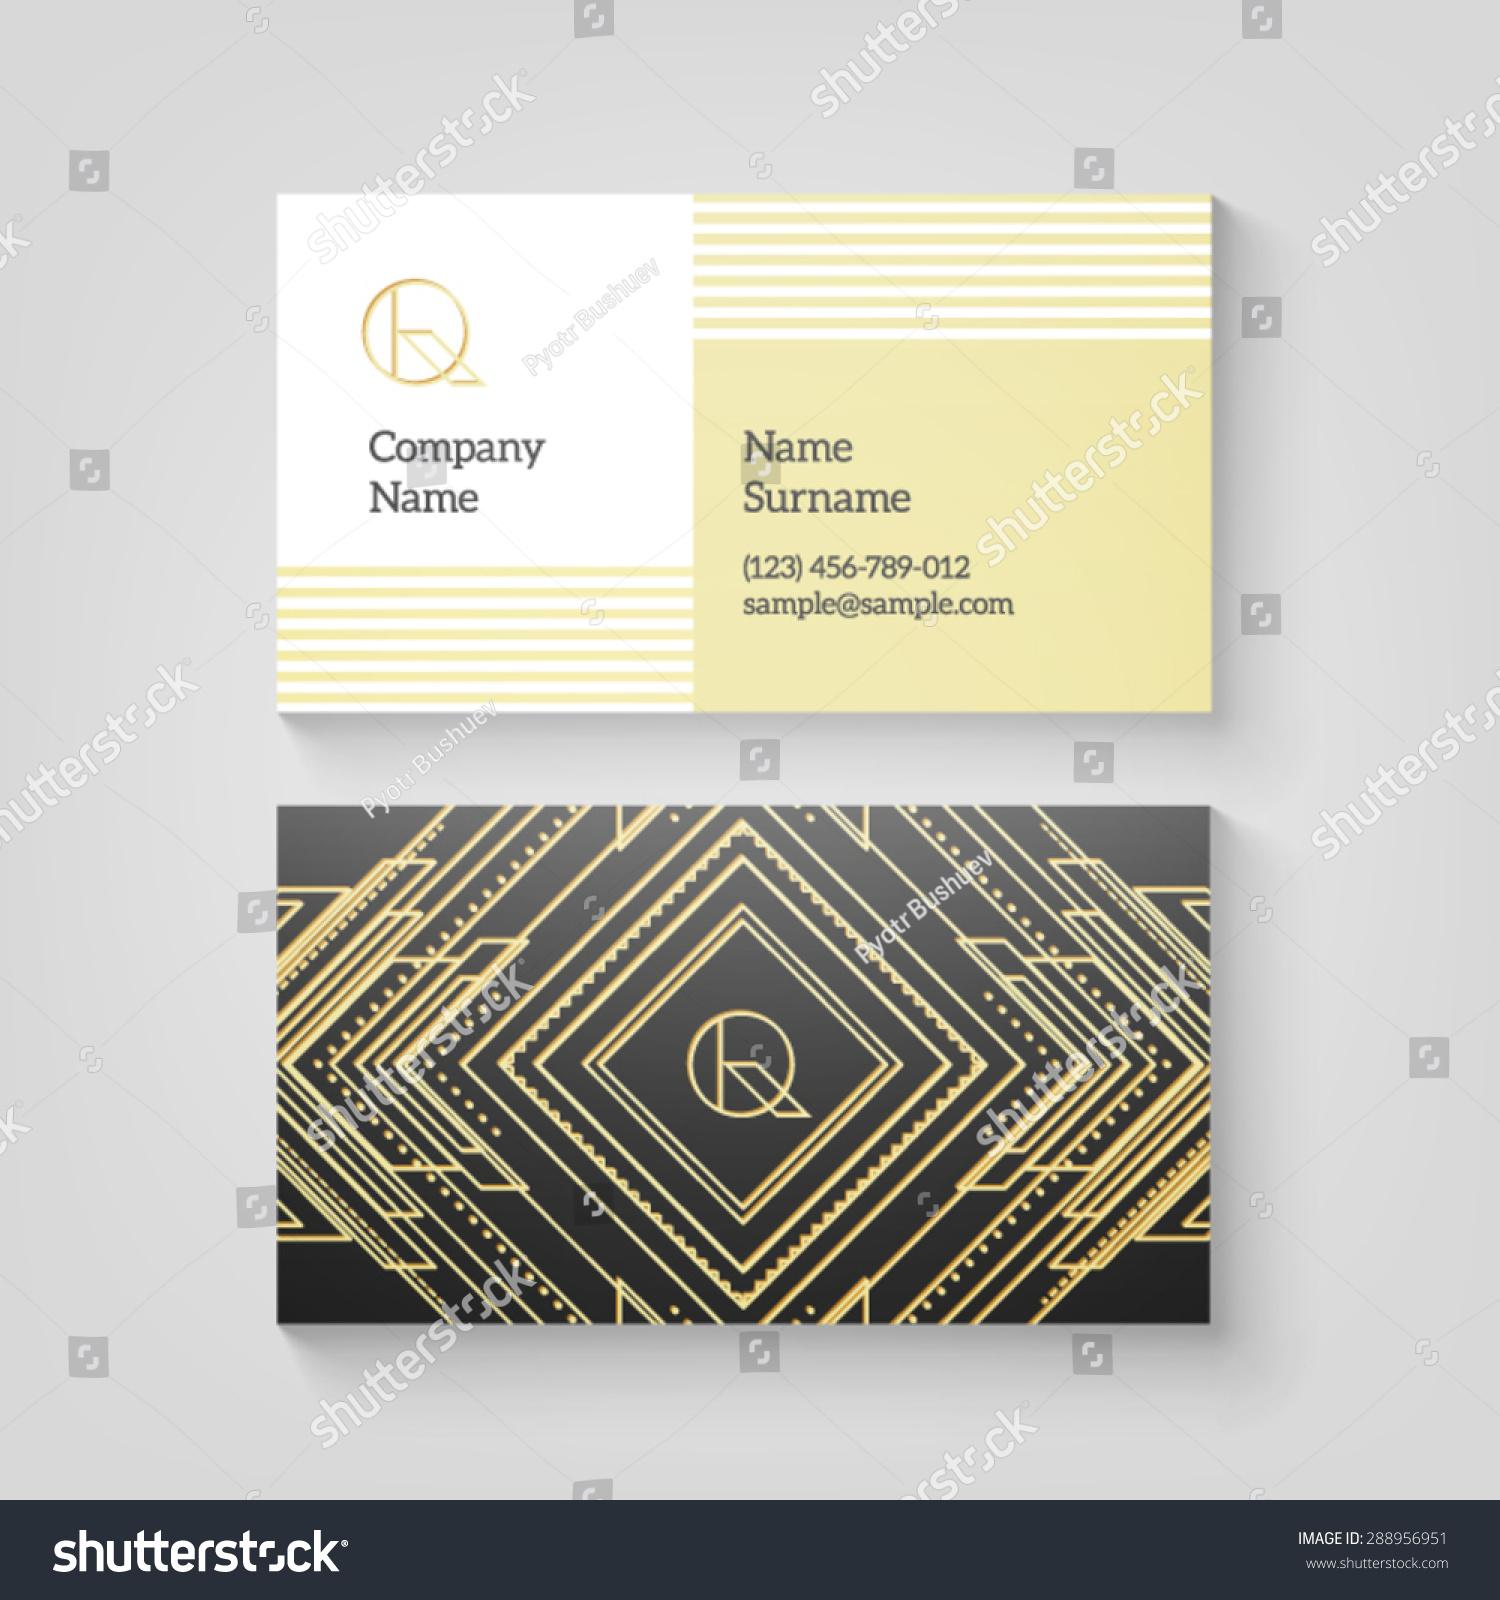 Vector Art Deco Business Card Template Stock Vector 288956951 ...